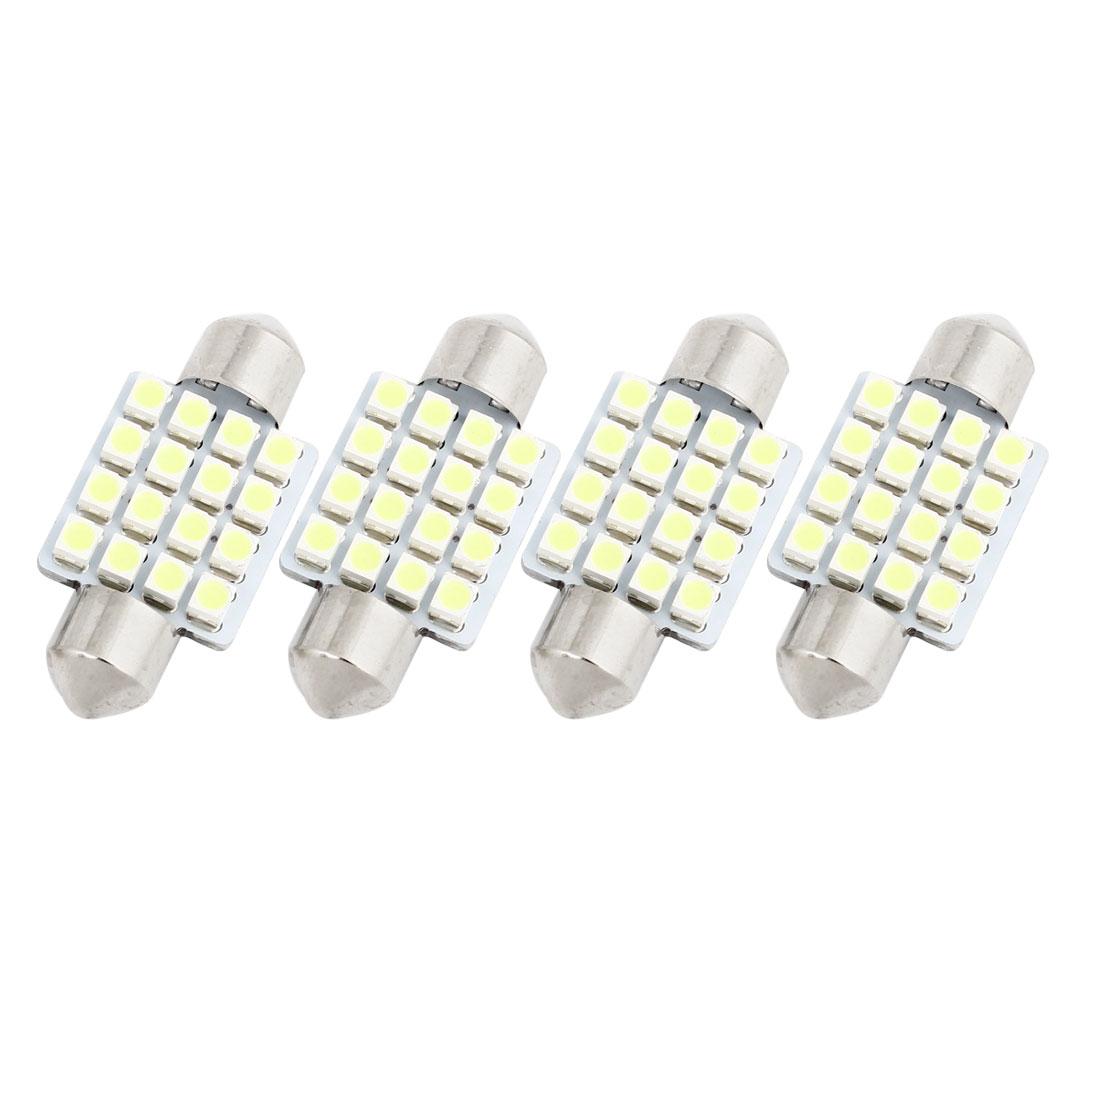 "4PCS 36mm 16-SMD 1.50"" 3528 1210 LED White Festoon Dome Map Light 6423 Internal"